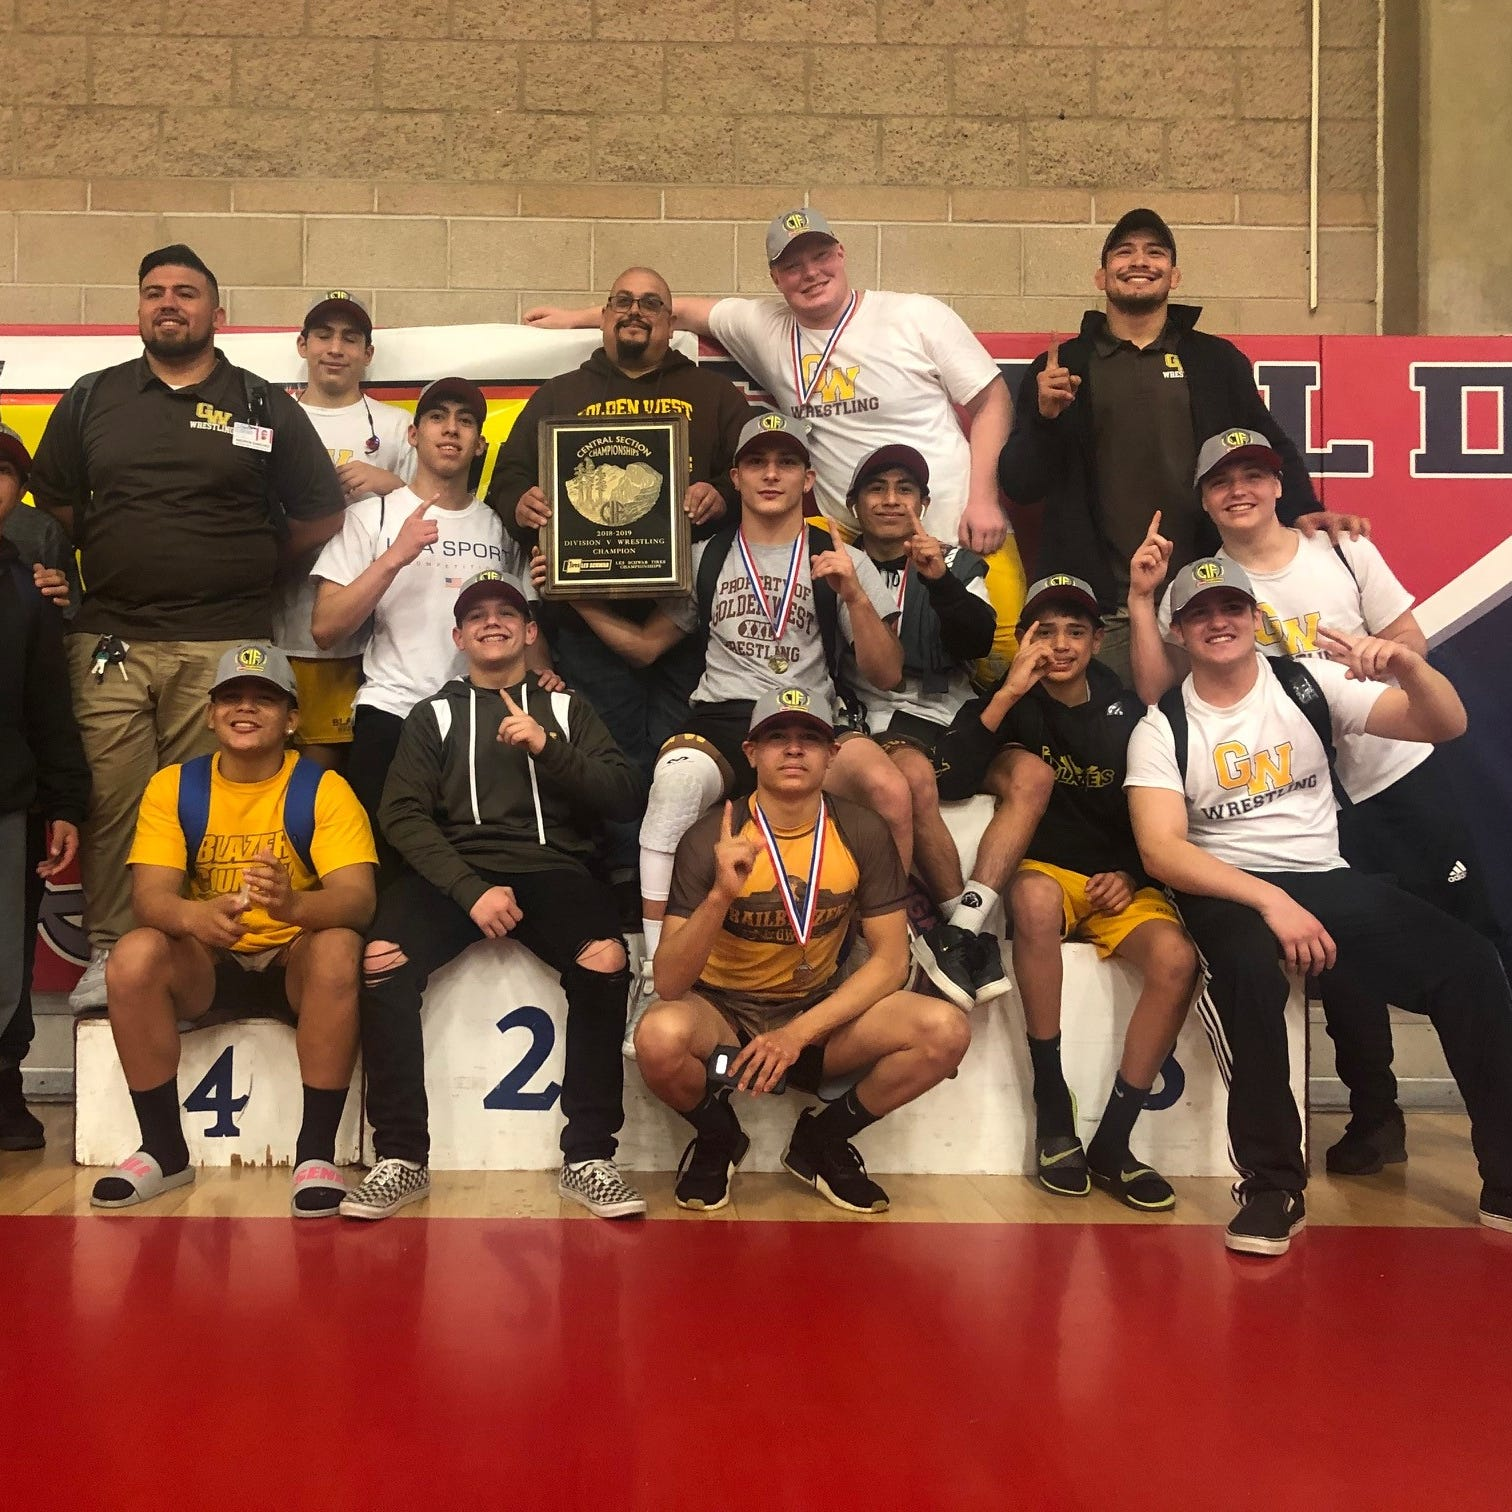 Golden West wrestling makes school history